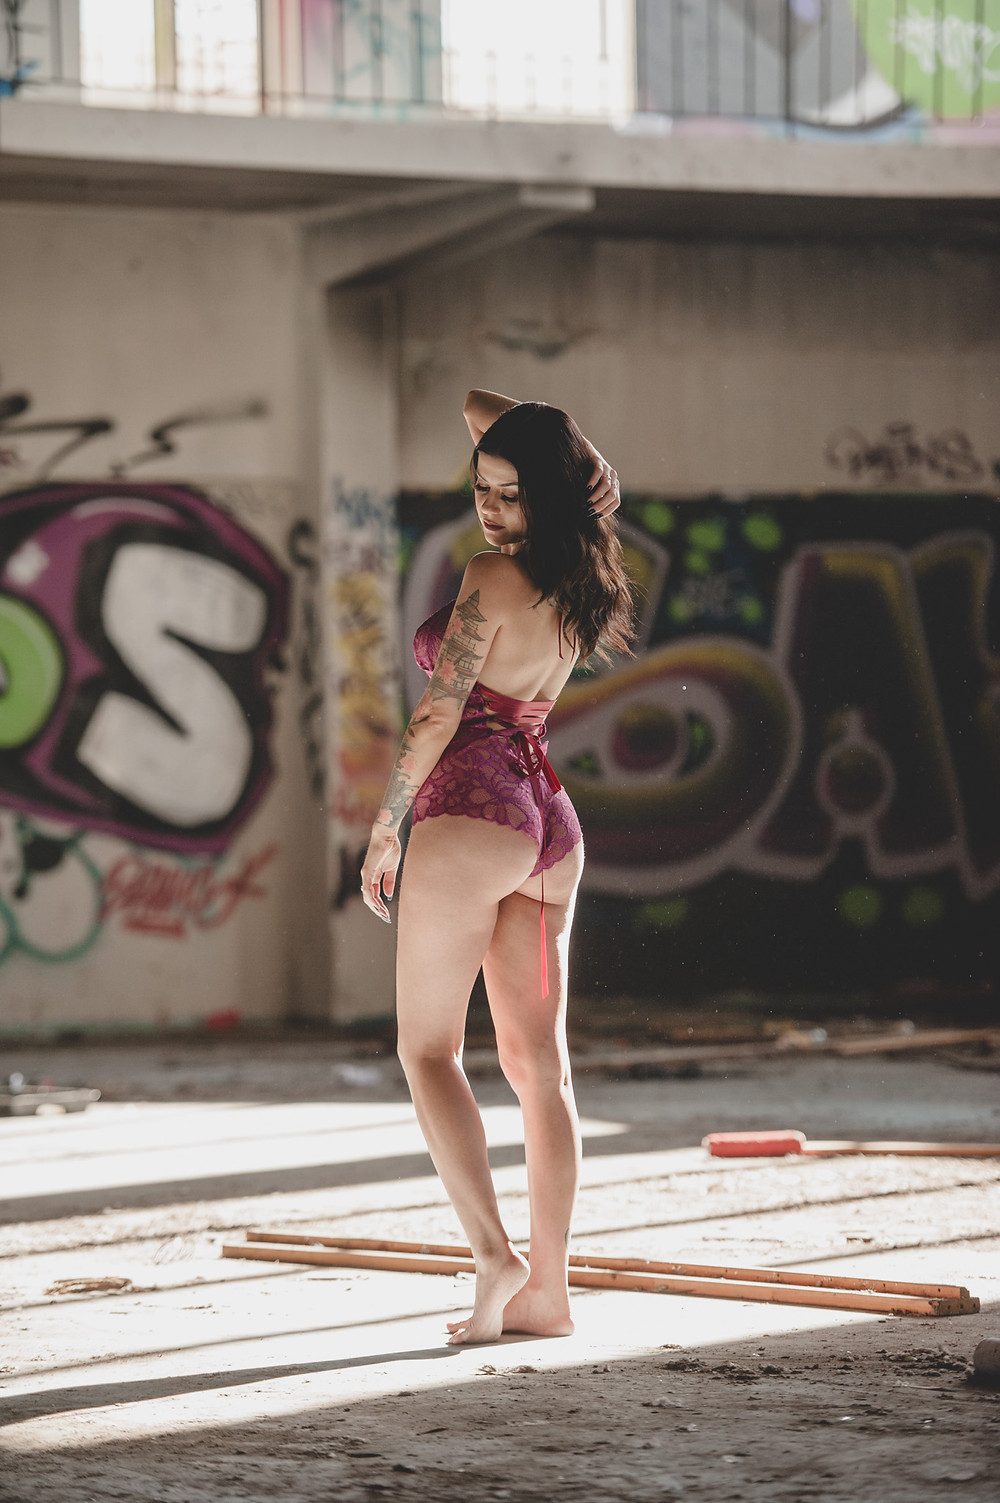 Jay Brosnan Photography | Brisbane Fashion Photographer | Sunshine Coast Fashion Photographer | Lingerie | Lingerie Photographer | Boudoir Photographer | Brisbane Photographer